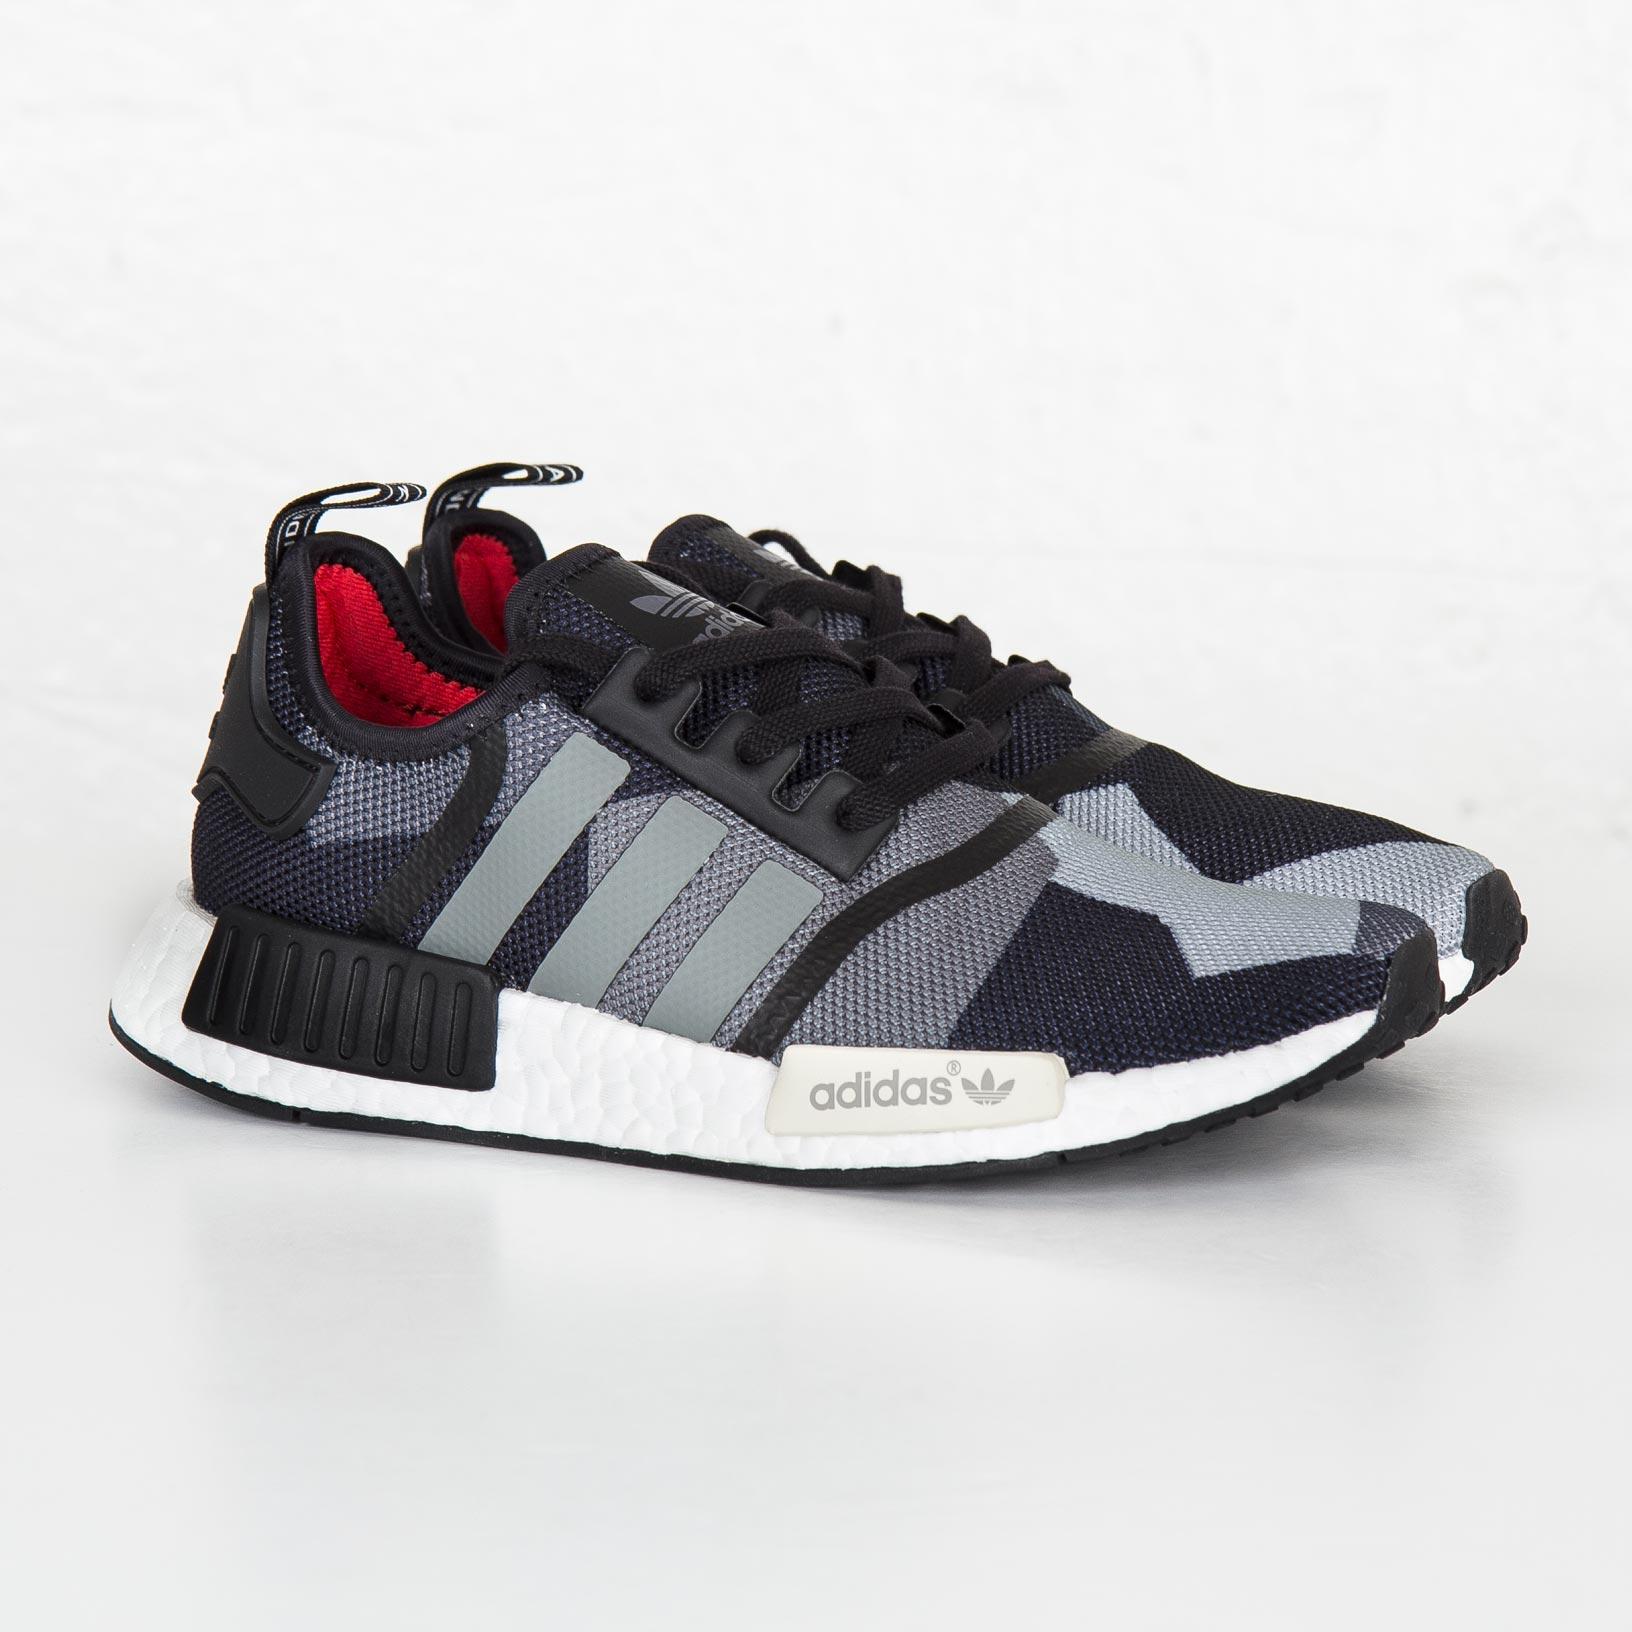 adidas nmd r1 s79163 sneakersnstuff turnschuhe und streetwear